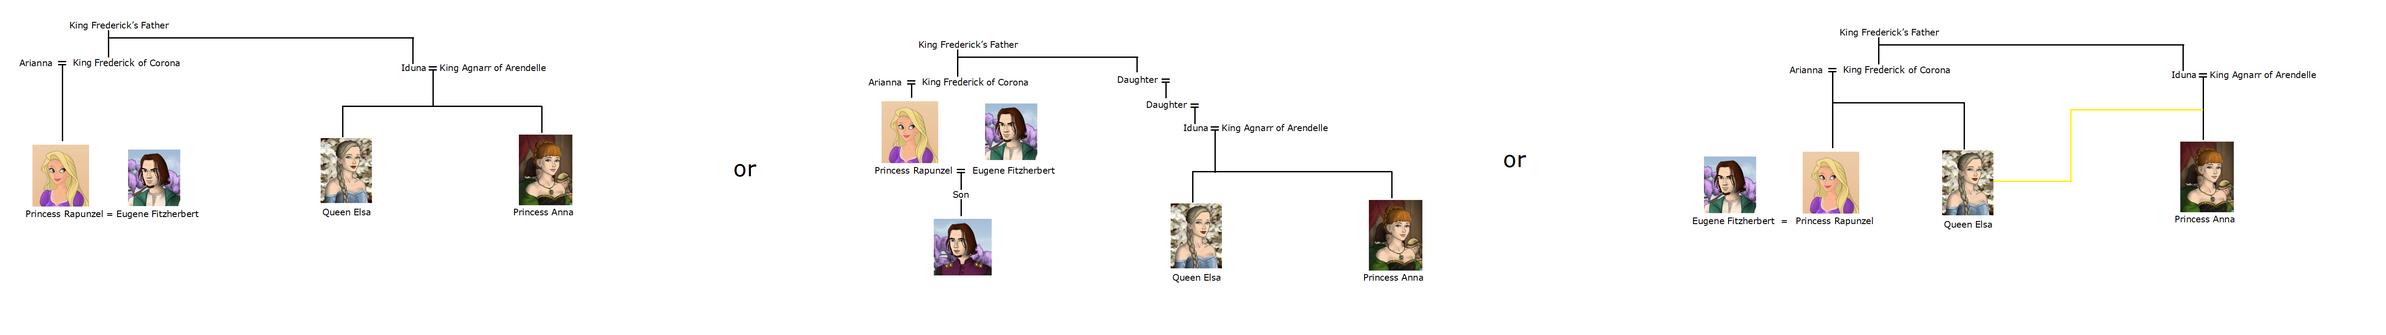 Rapunzel theory by TFfan234